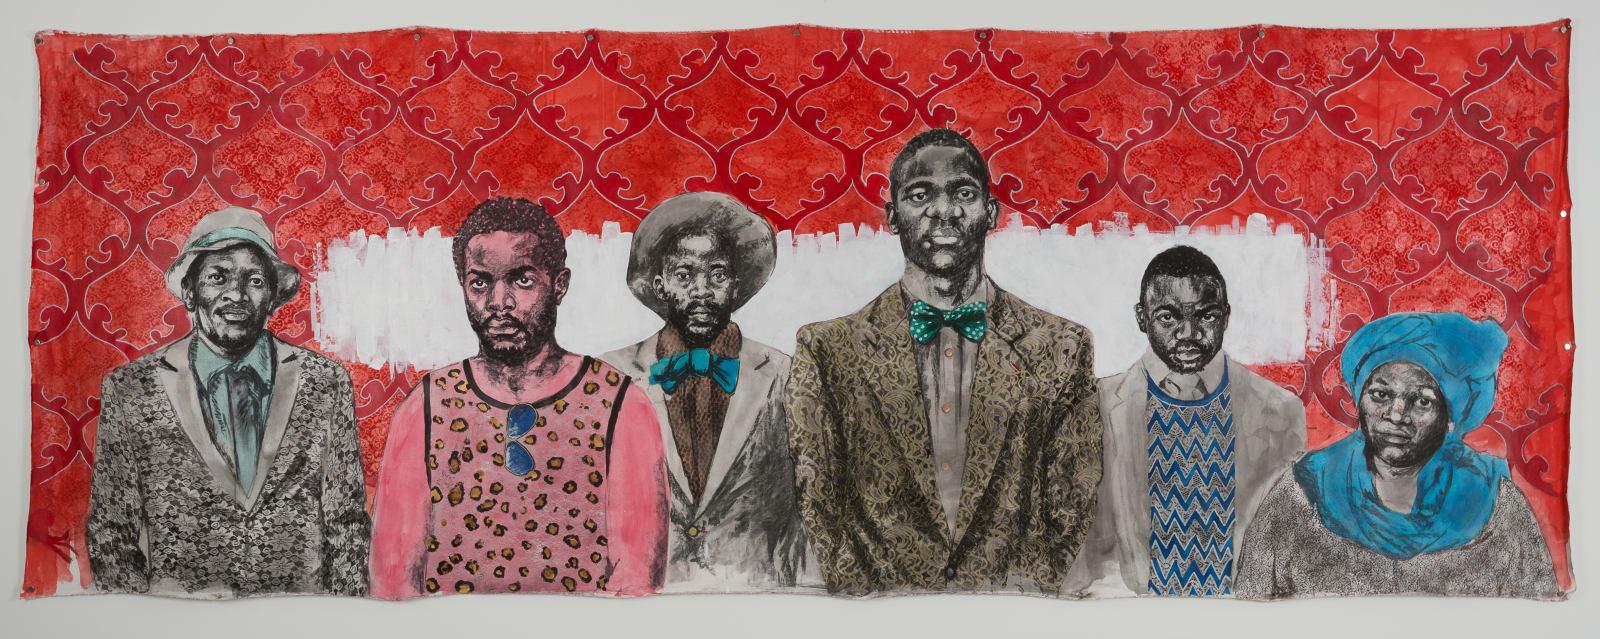 Bambo Sibiya  Custodians of the Swenka Movement , 2017  Charcoal and acrylic on canvas  150 x 400 cm